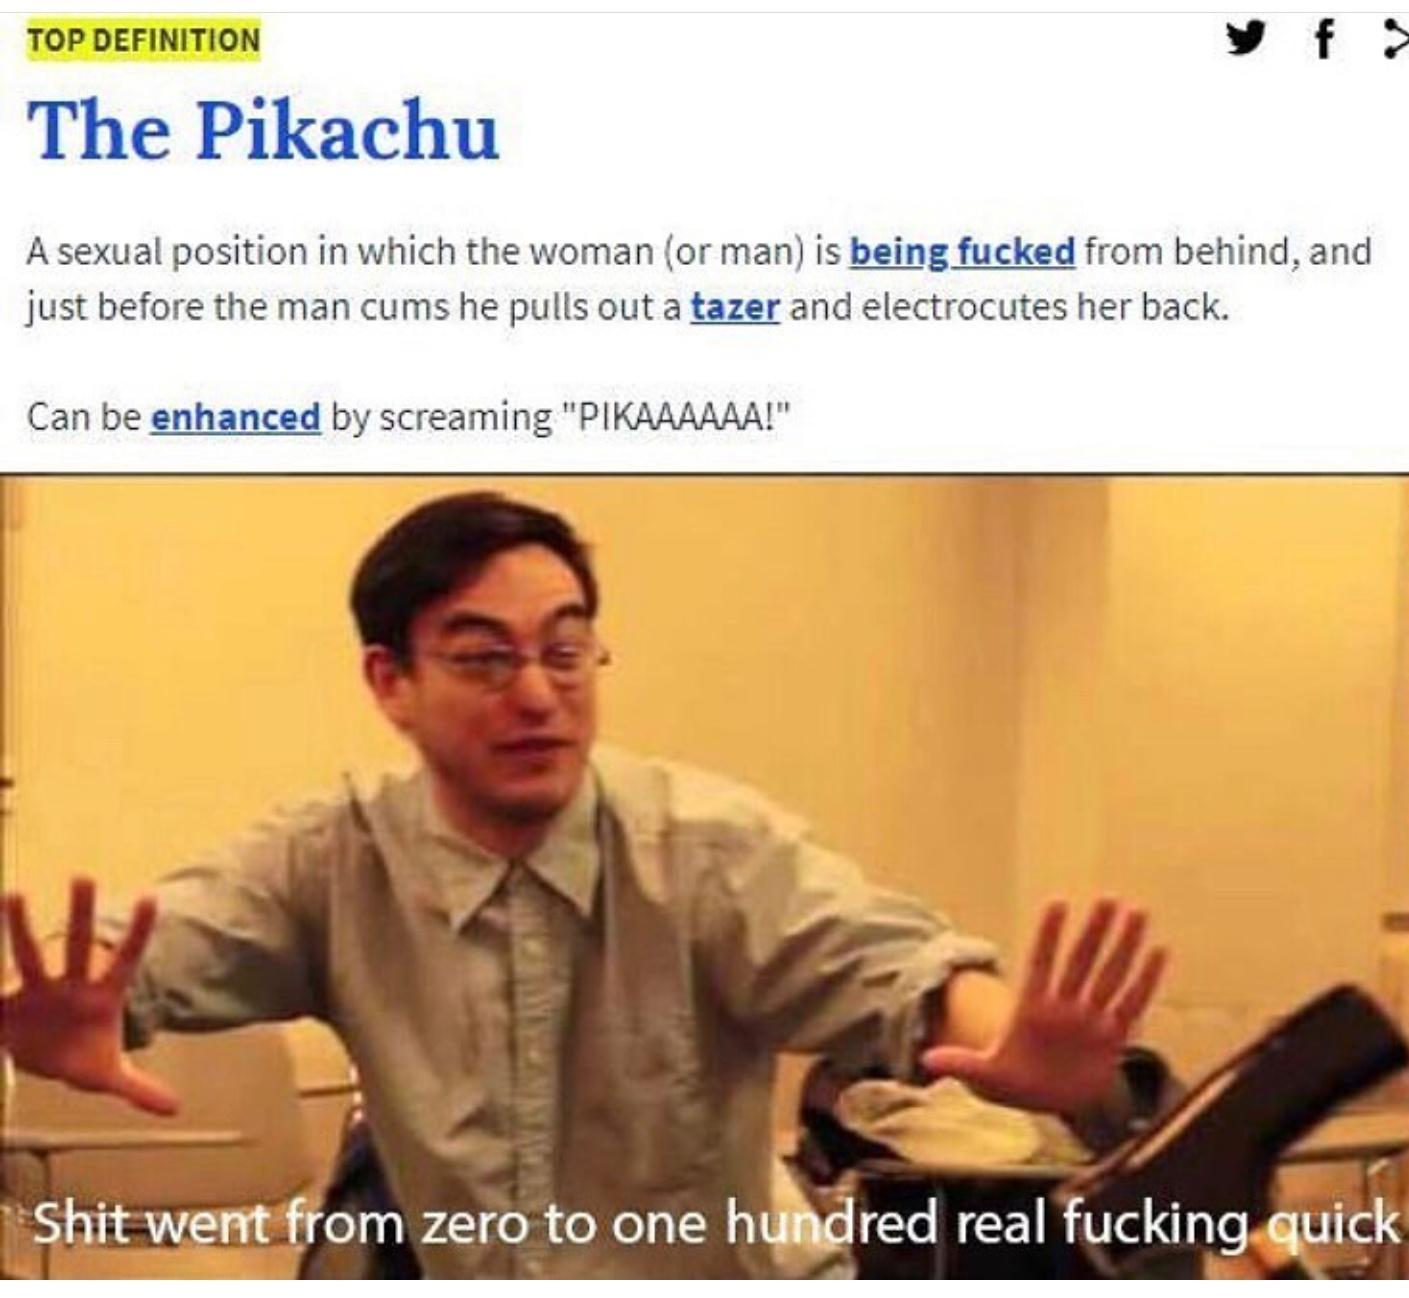 Real quick - meme